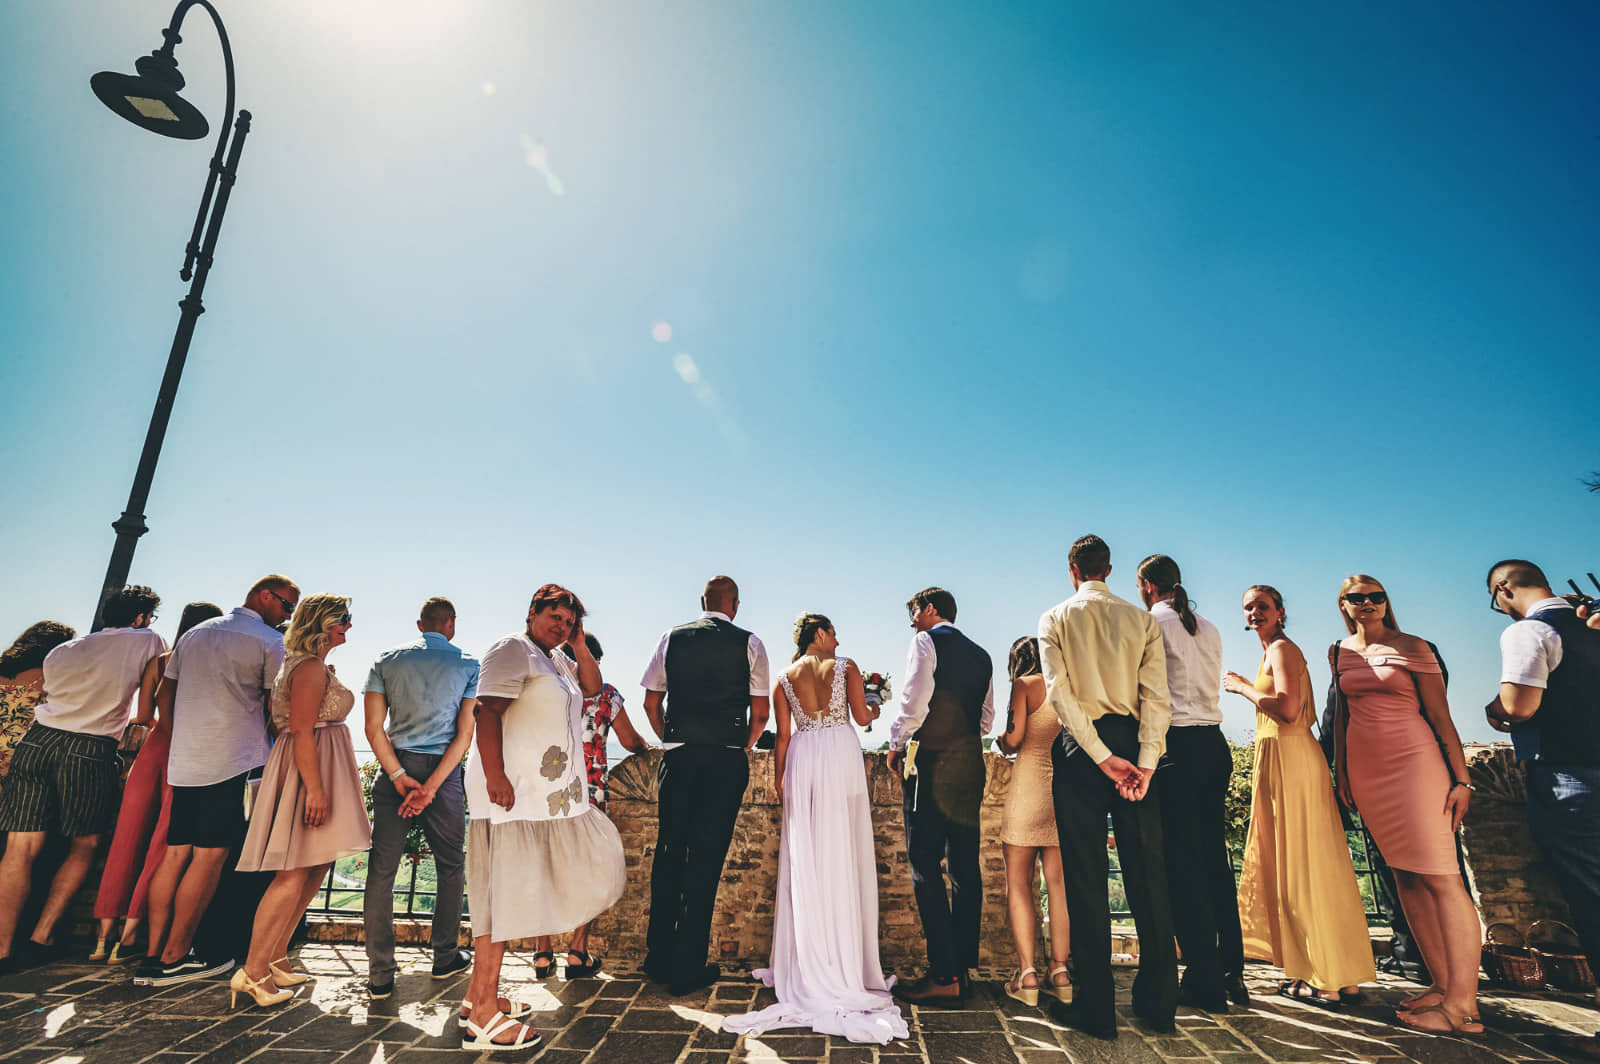 Romantická svatba v Itálii - Obrázek č. 2